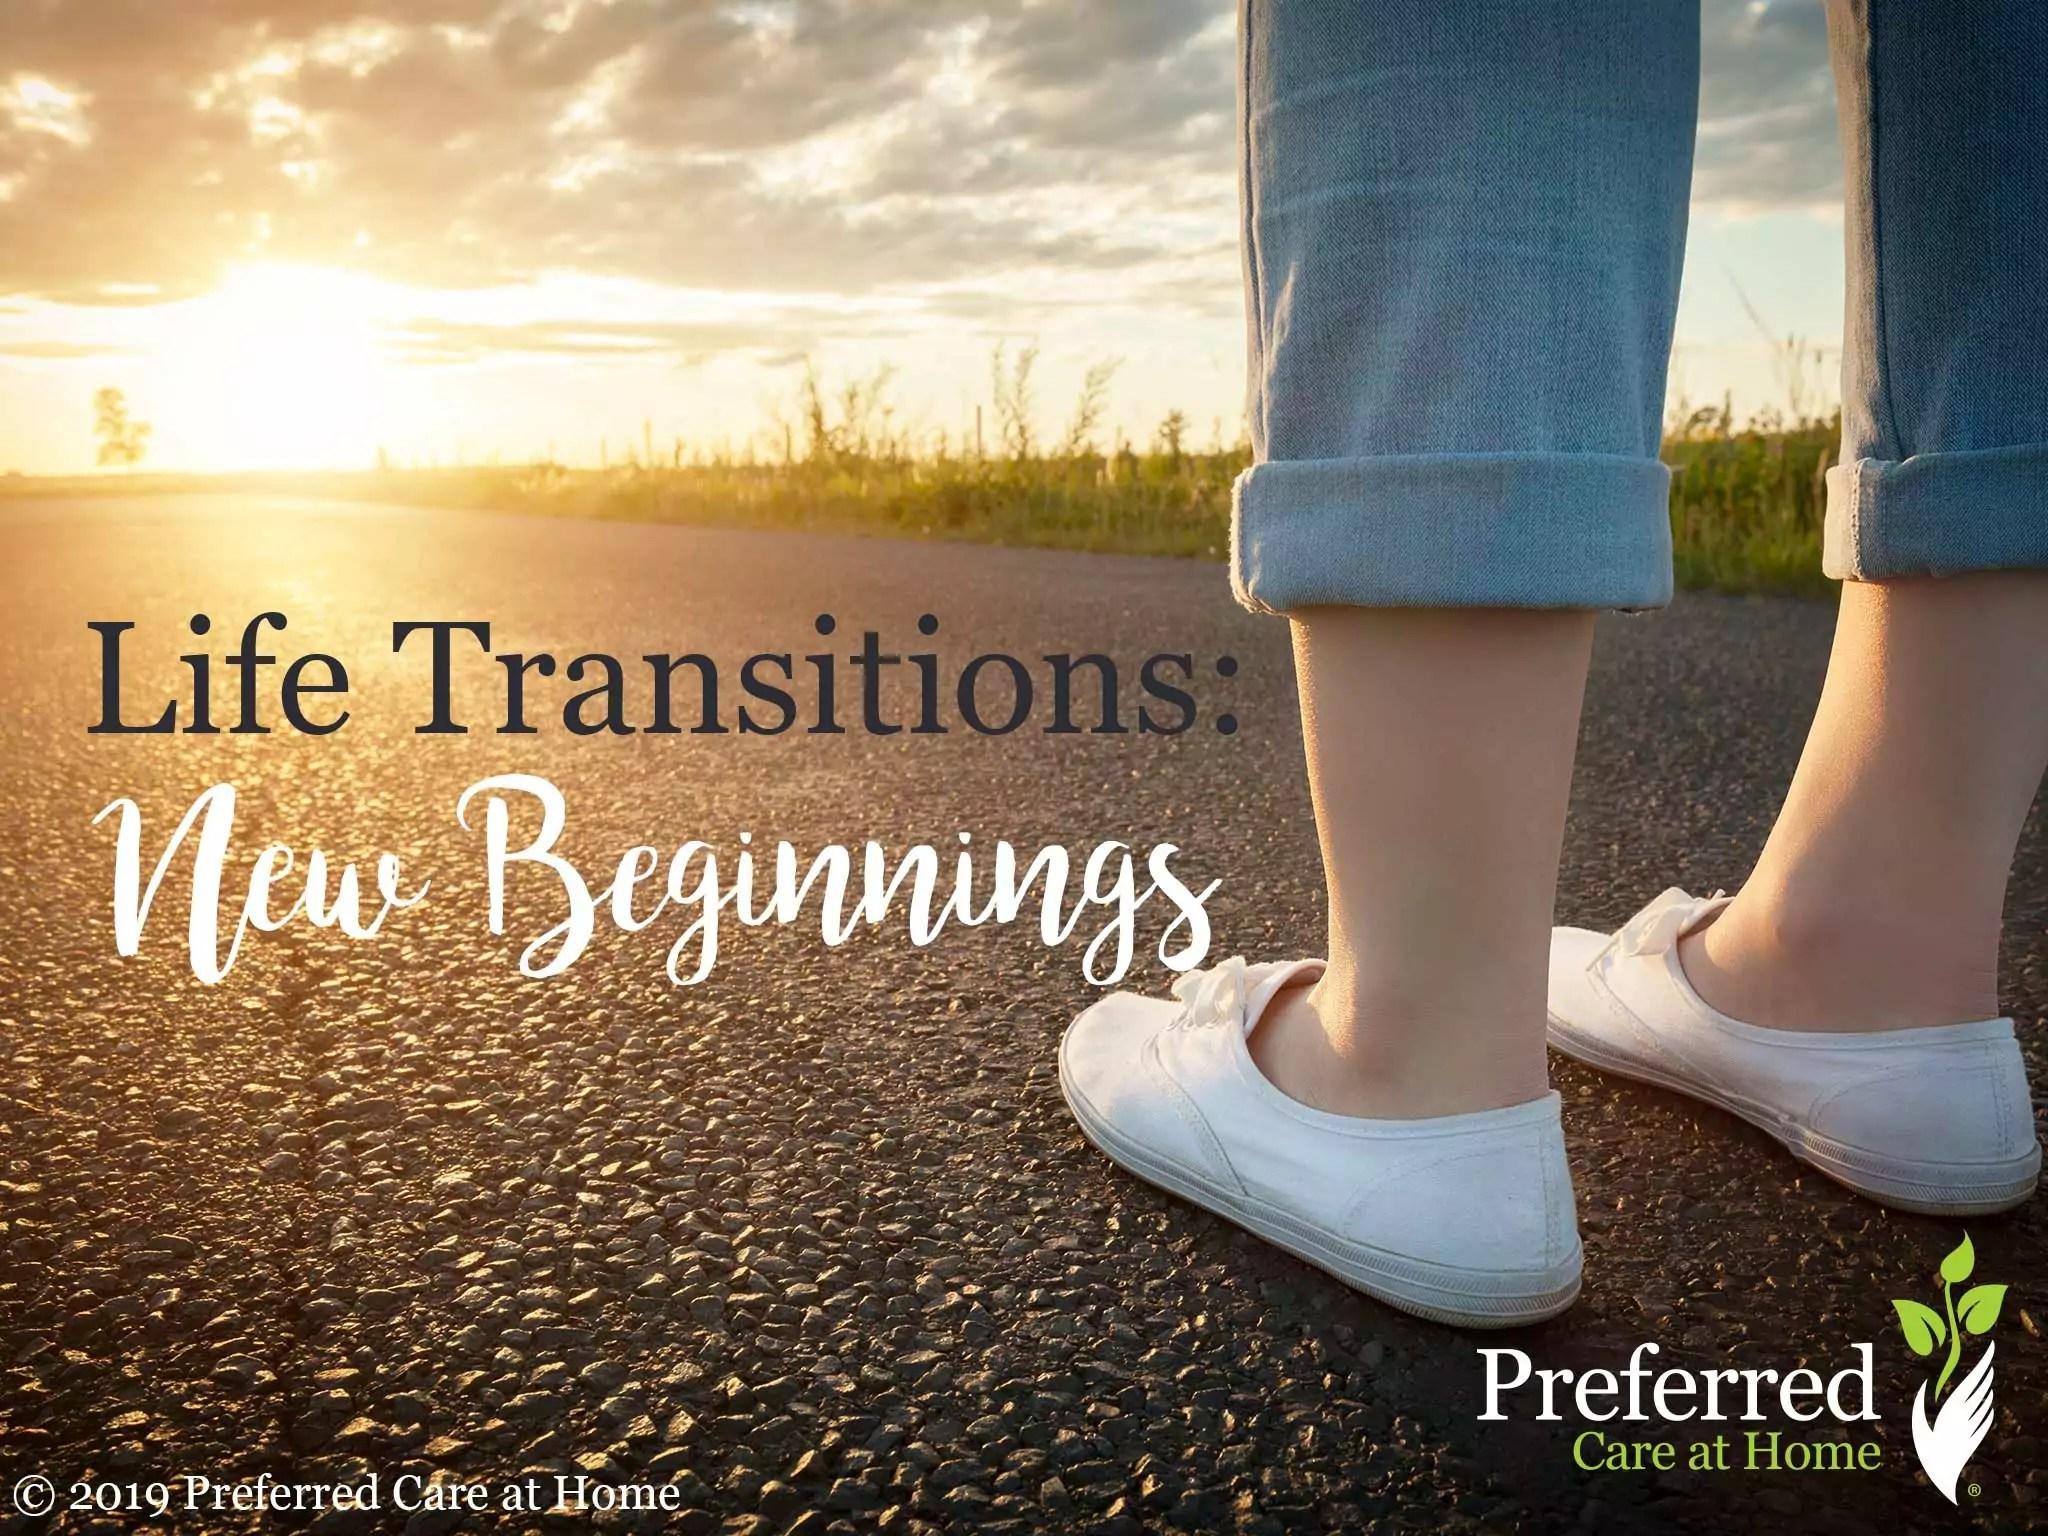 Life Transitions New Beginnings